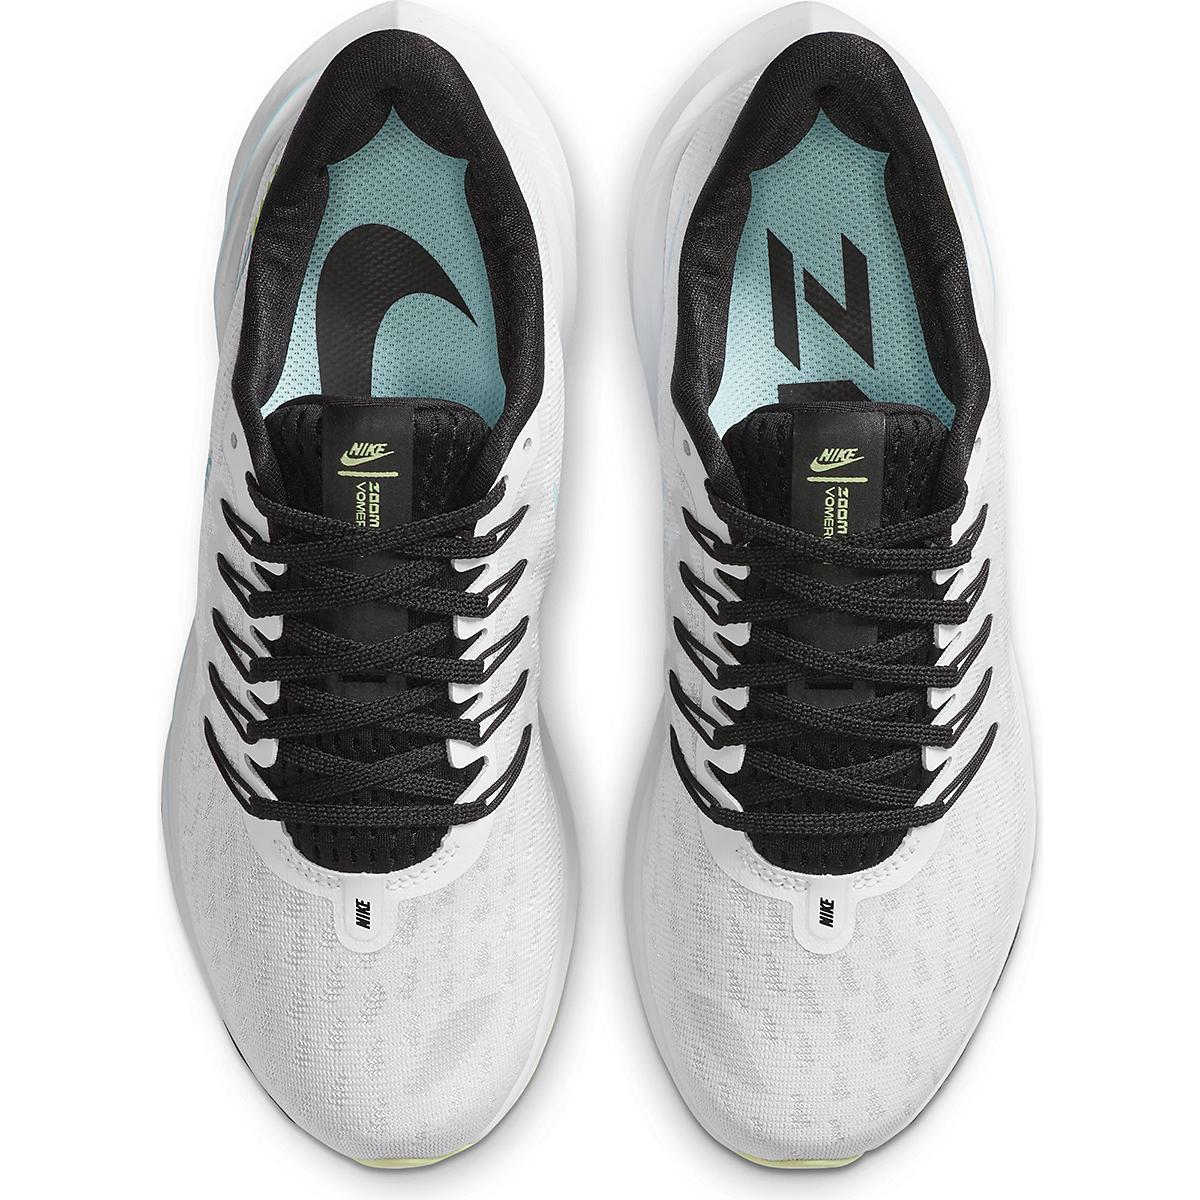 Women's Nike Vomero 14 Running Shoe - Color: White/Glacier Ice-Black-Pure Platinum - Size: 5 - Width: Regular, White/Glacier Ice-Black-Pure Platinum, large, image 4